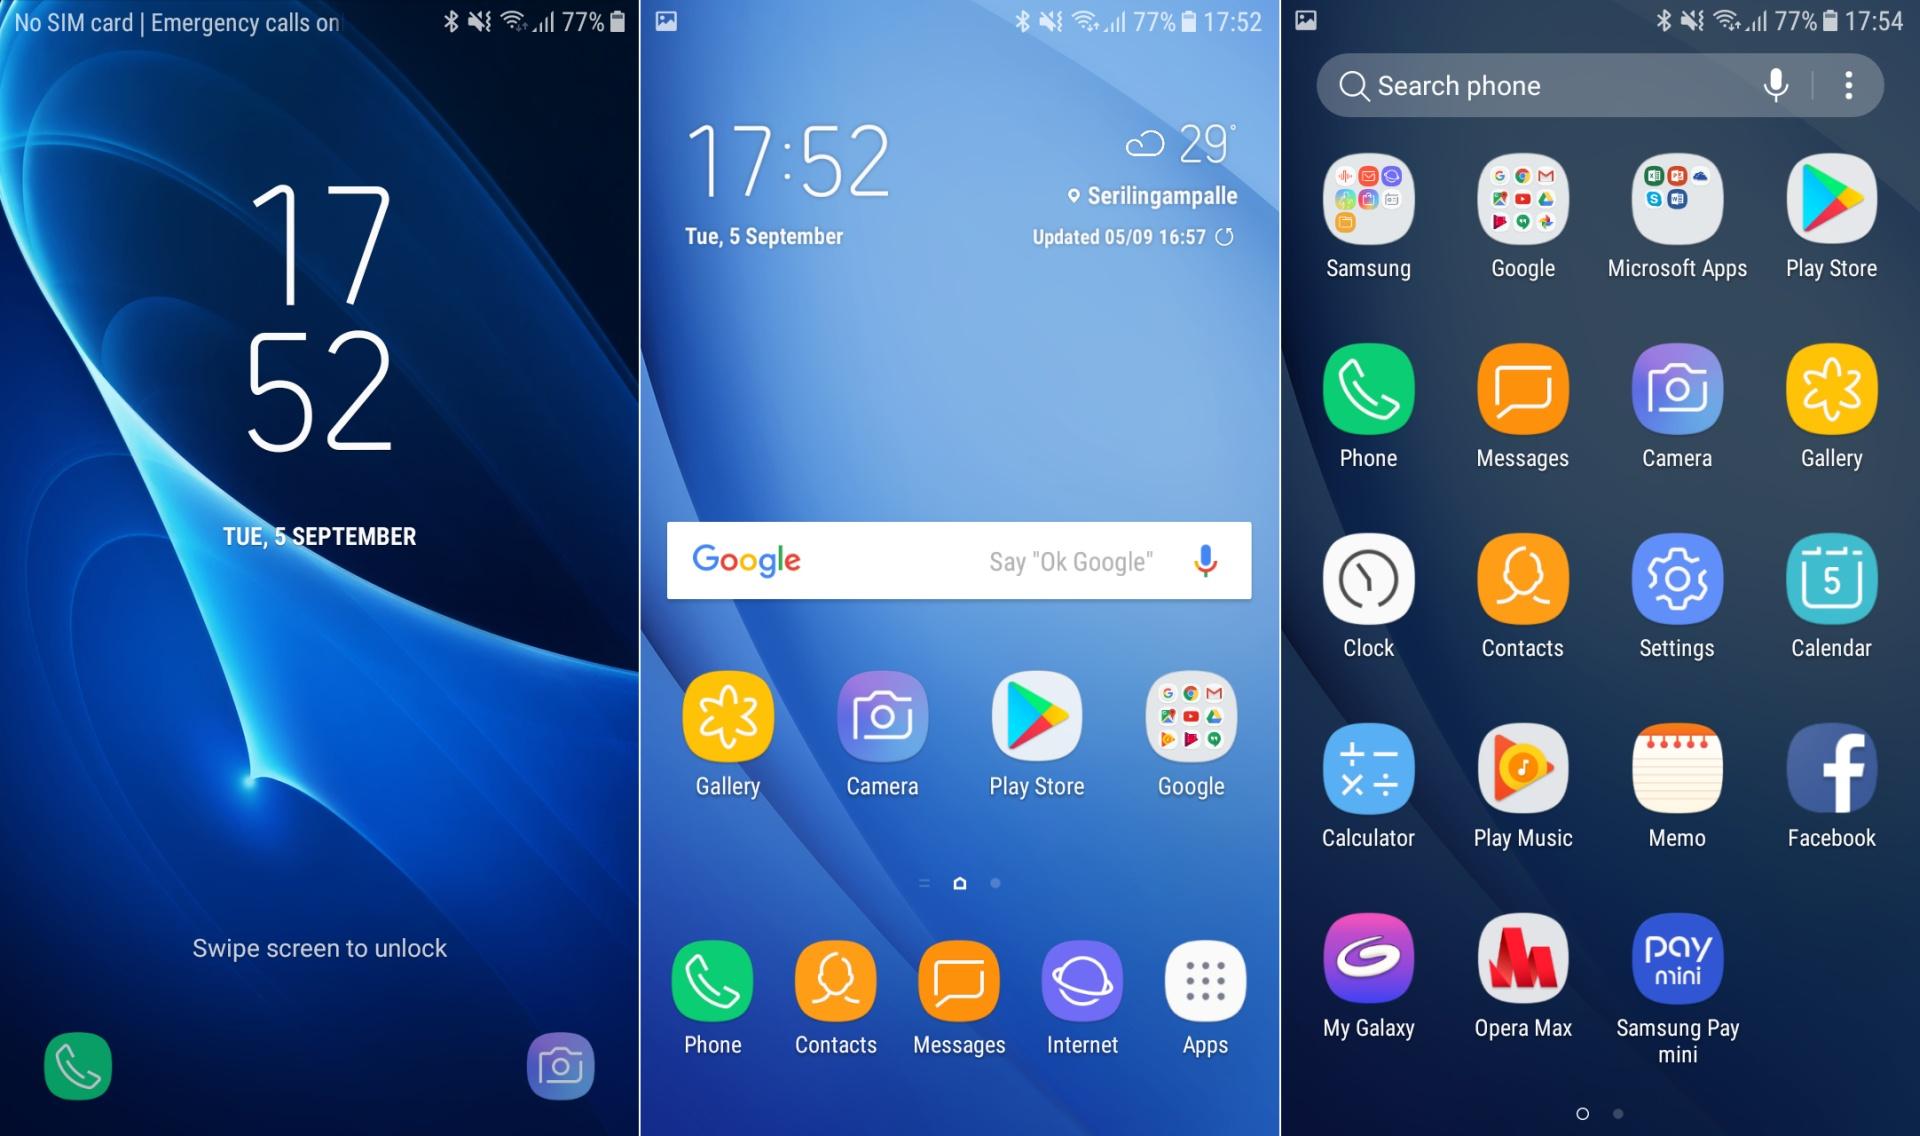 Screenshots Galaxy J5 And Galaxy J7 2016 Nougat With Samsung Experience Ux Sammobile